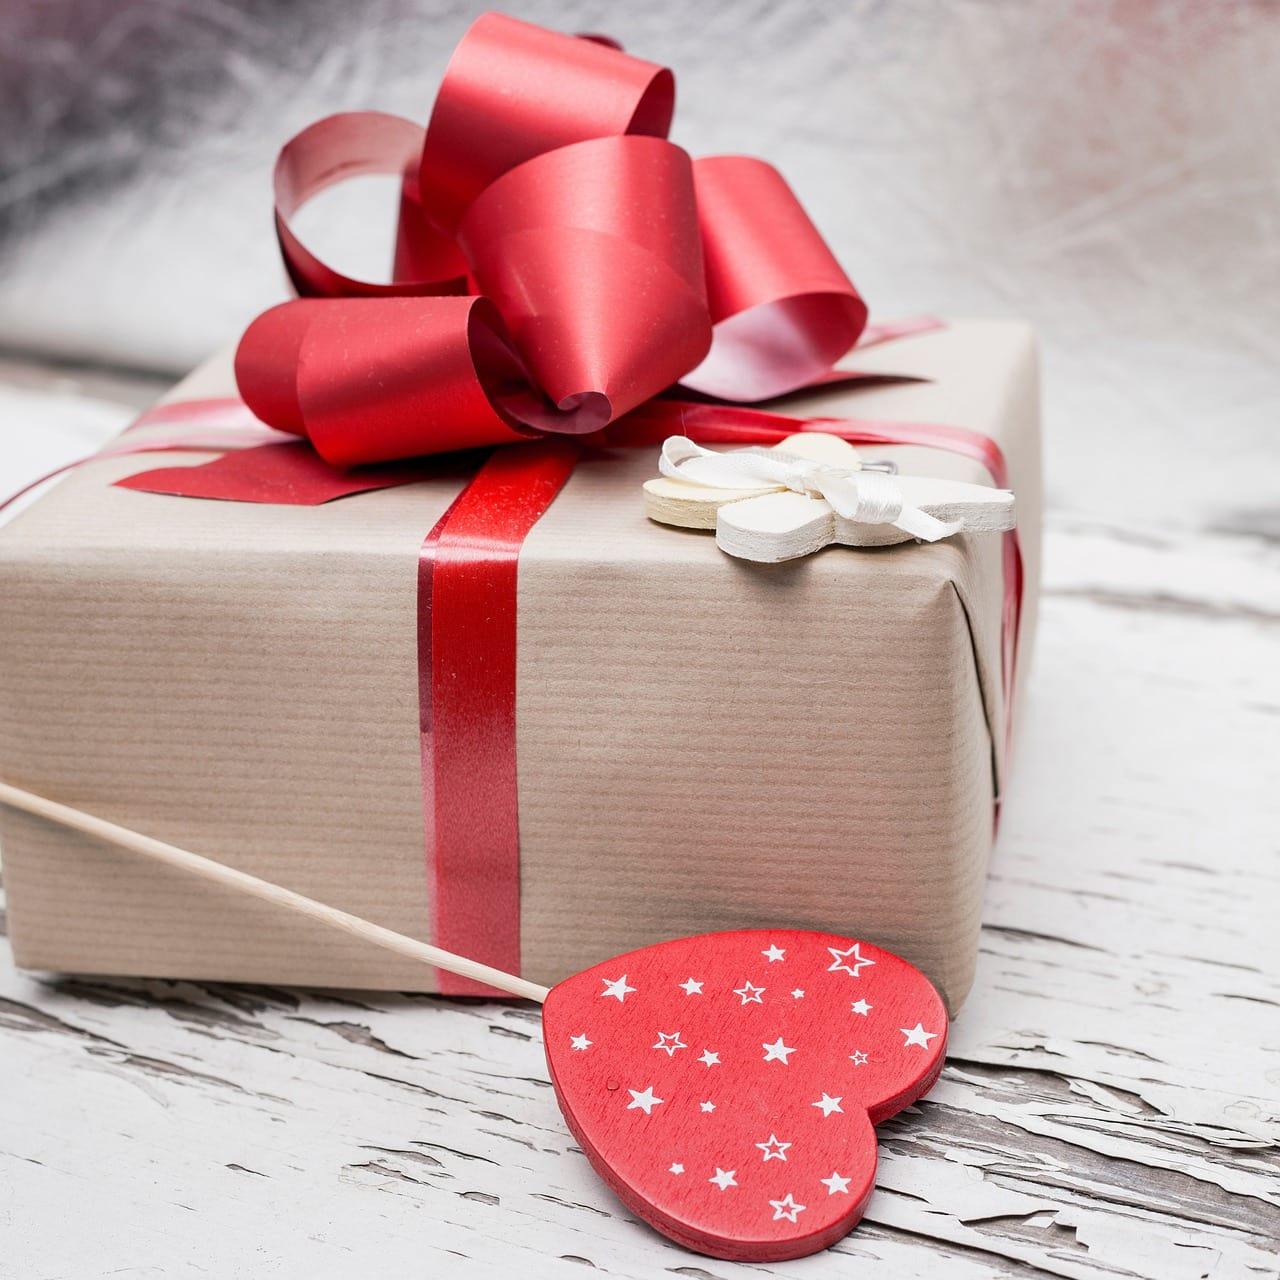 Подарки и оплата услуг